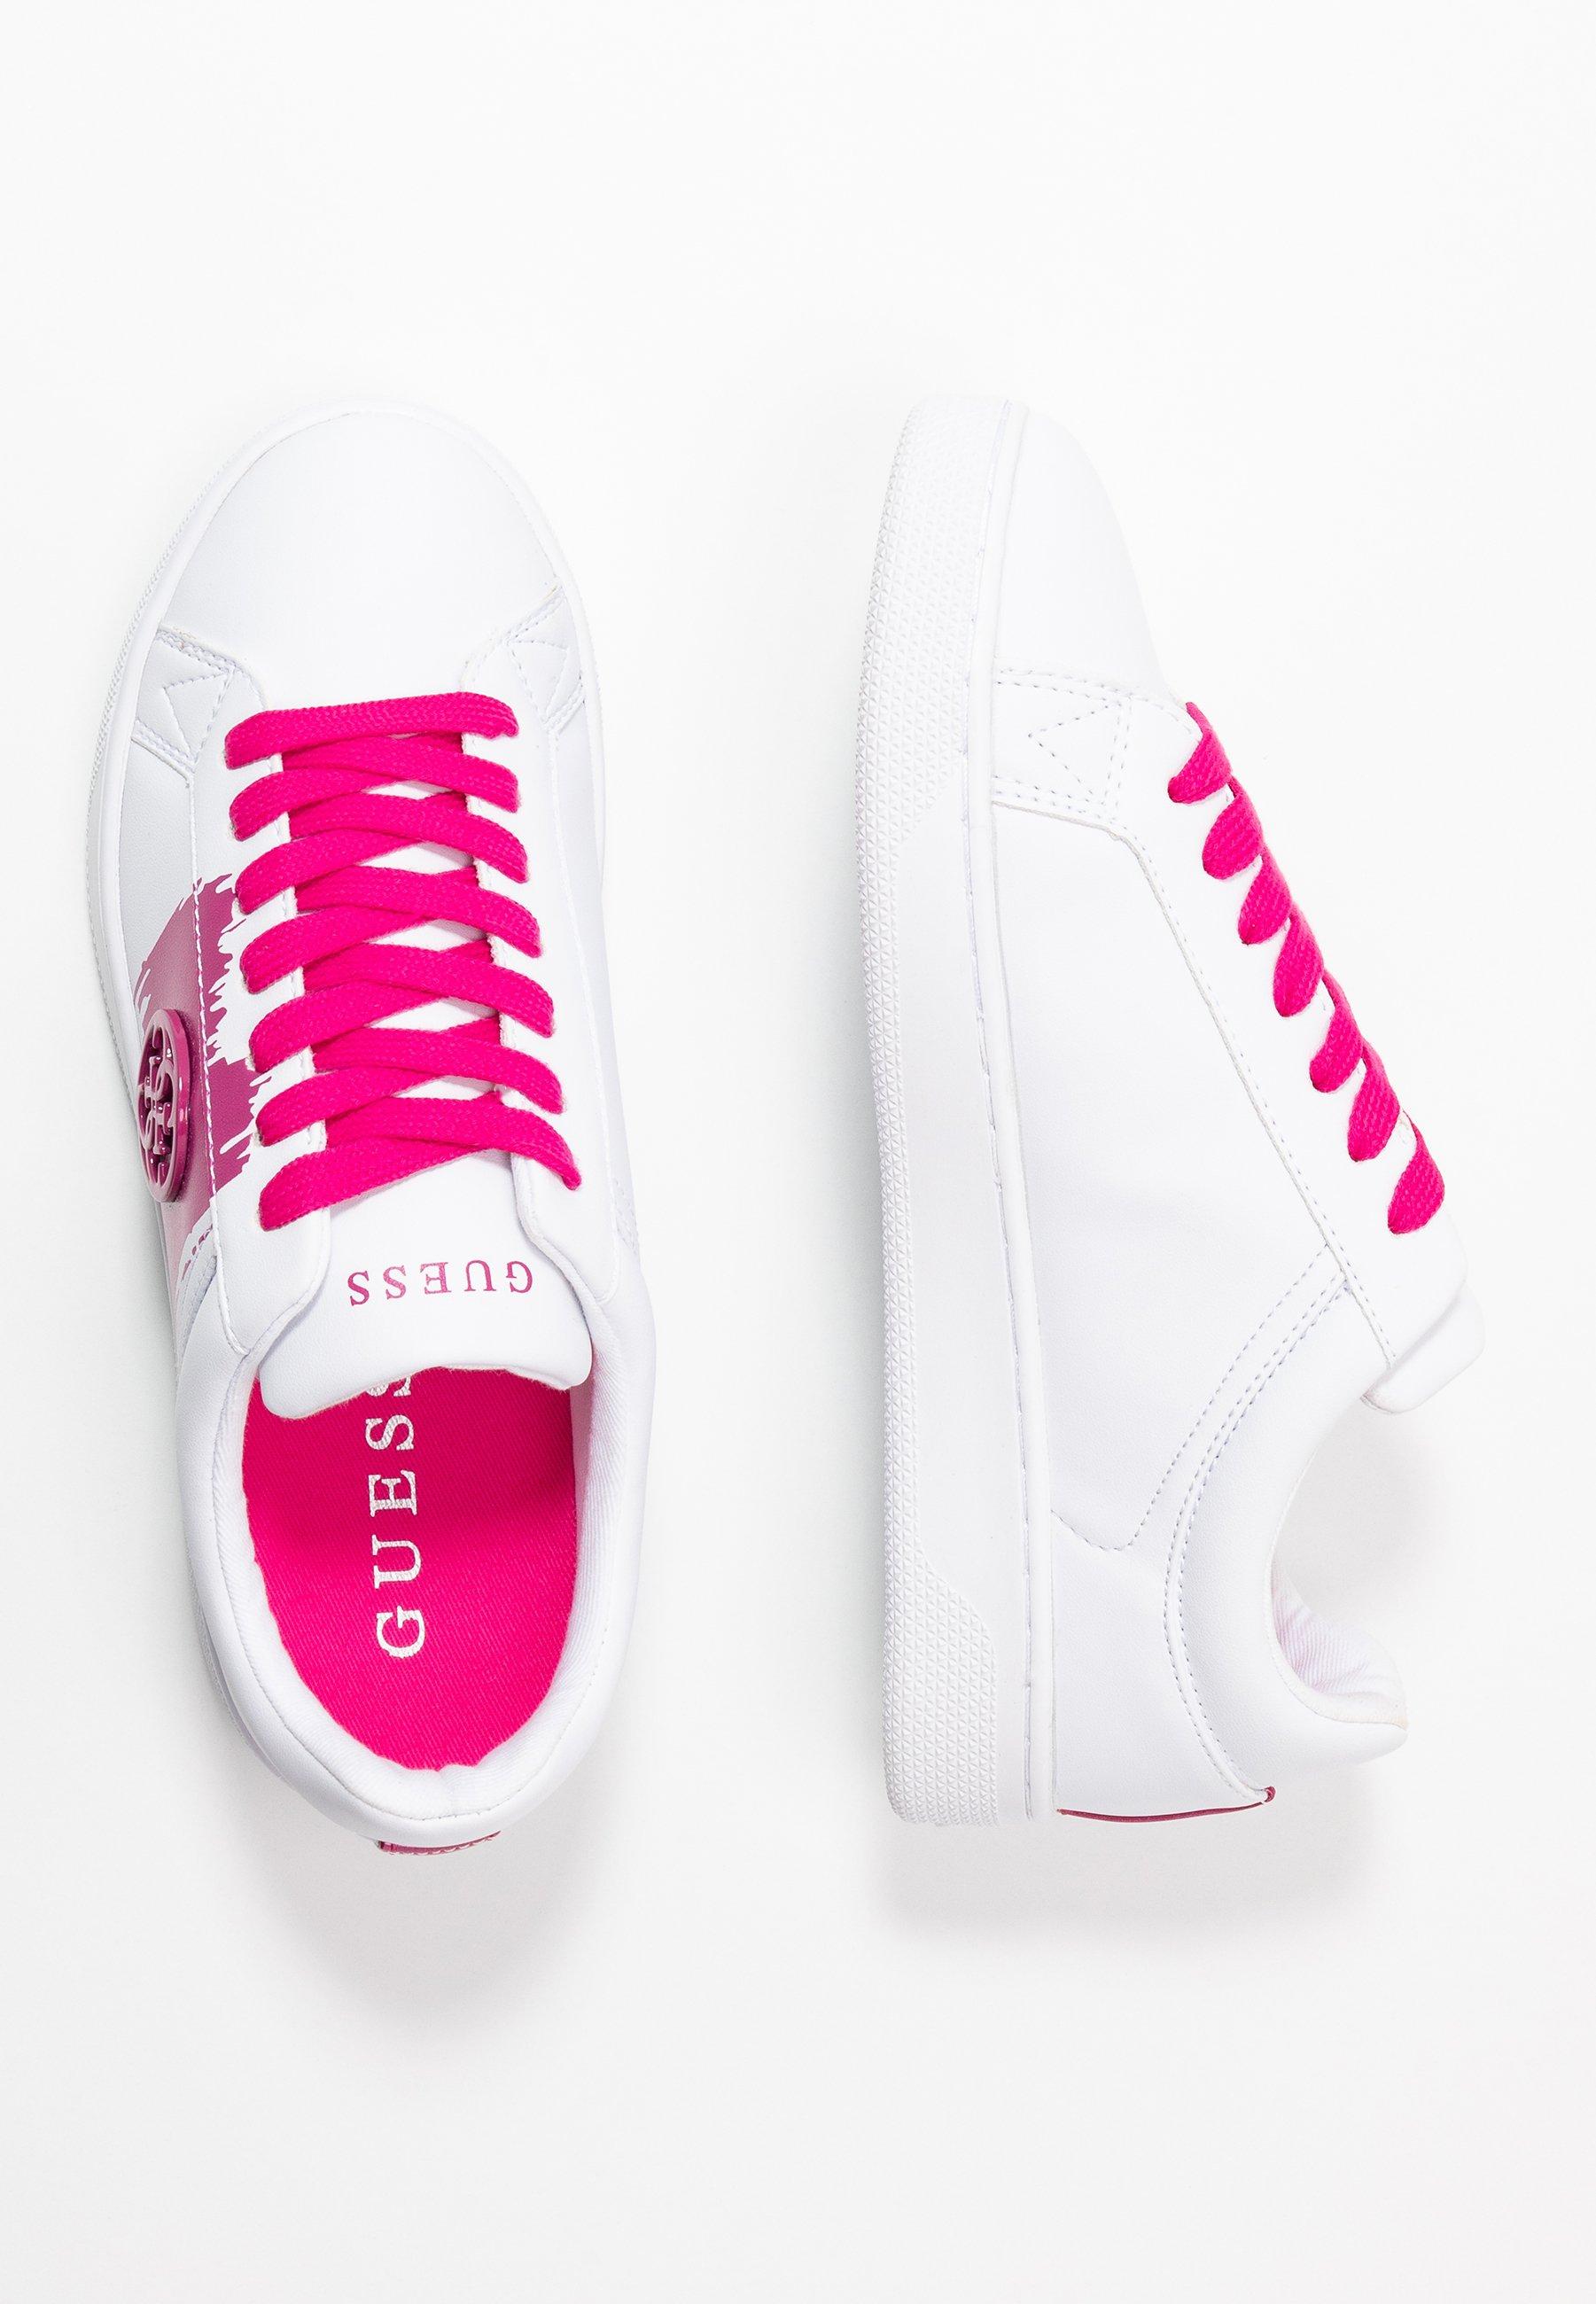 Guess Reima - Sneakers White/fuxia